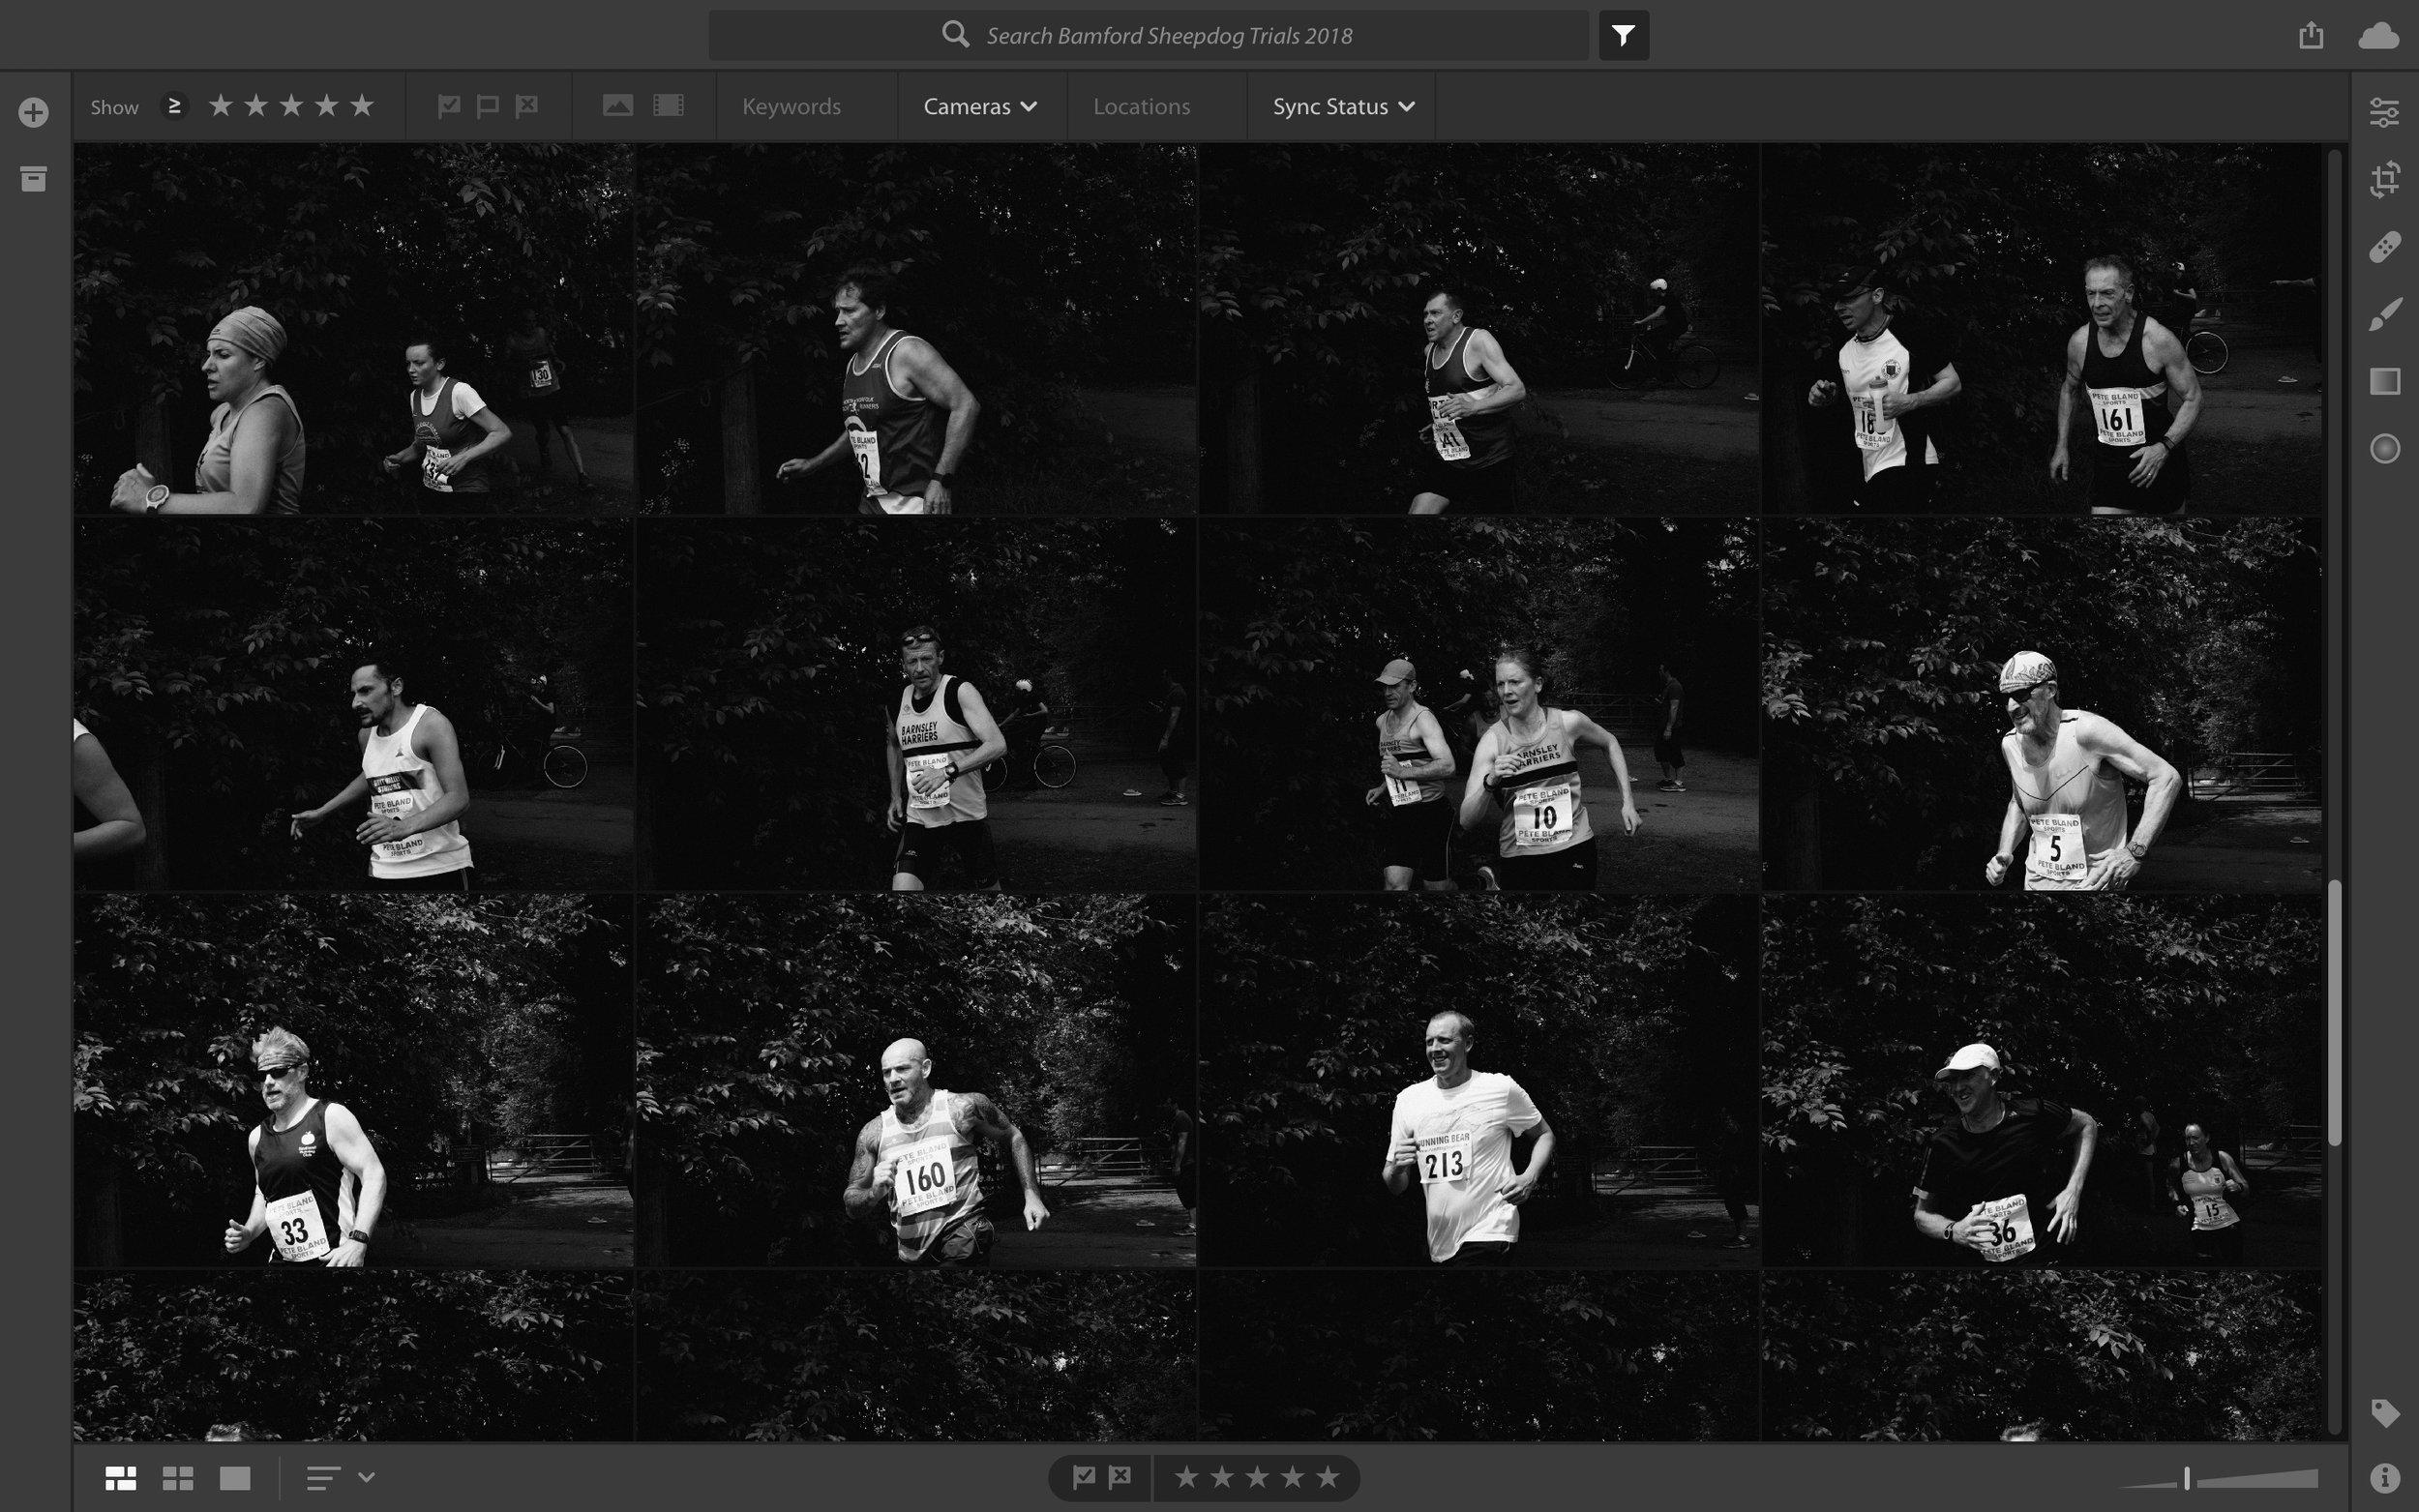 Screen Shot 2018-05-28 at 19.52.30.jpg